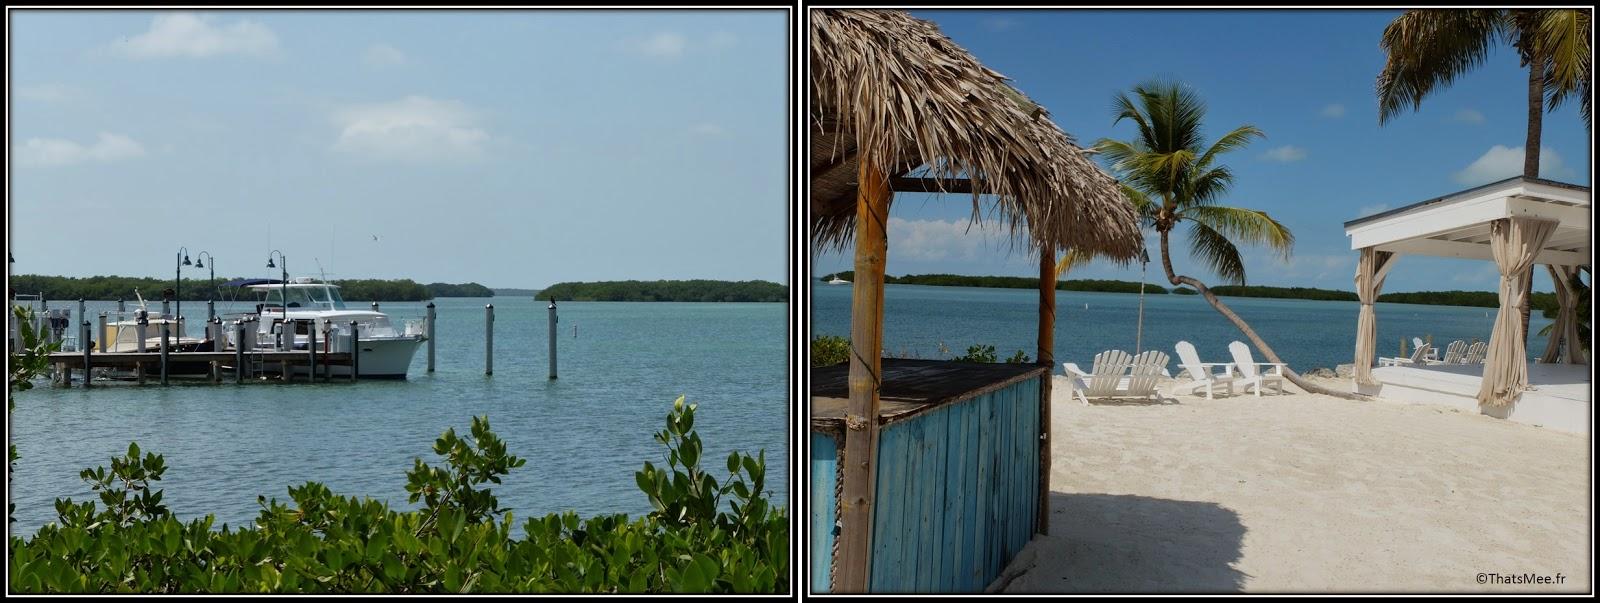 beach Morada Bay Café Islamorada The Keys Florida plage